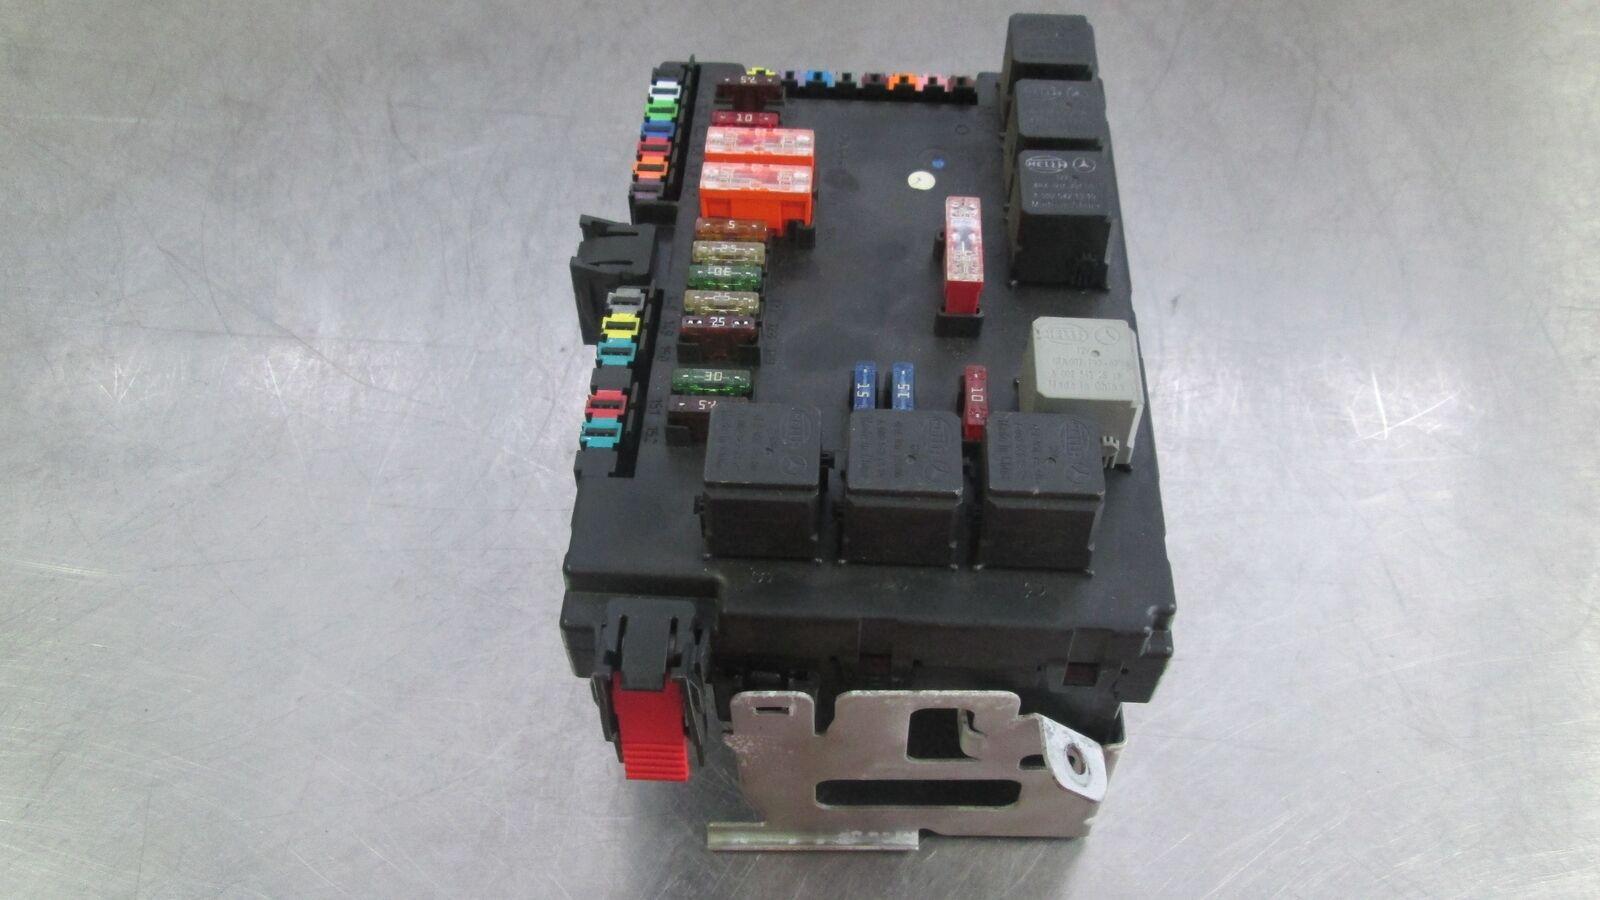 Rear Trunk Fuse Box Block 2215406450 Mercedes S550 W221 2009 273245574563 3 2009 s550 fuse box wiring diagrams